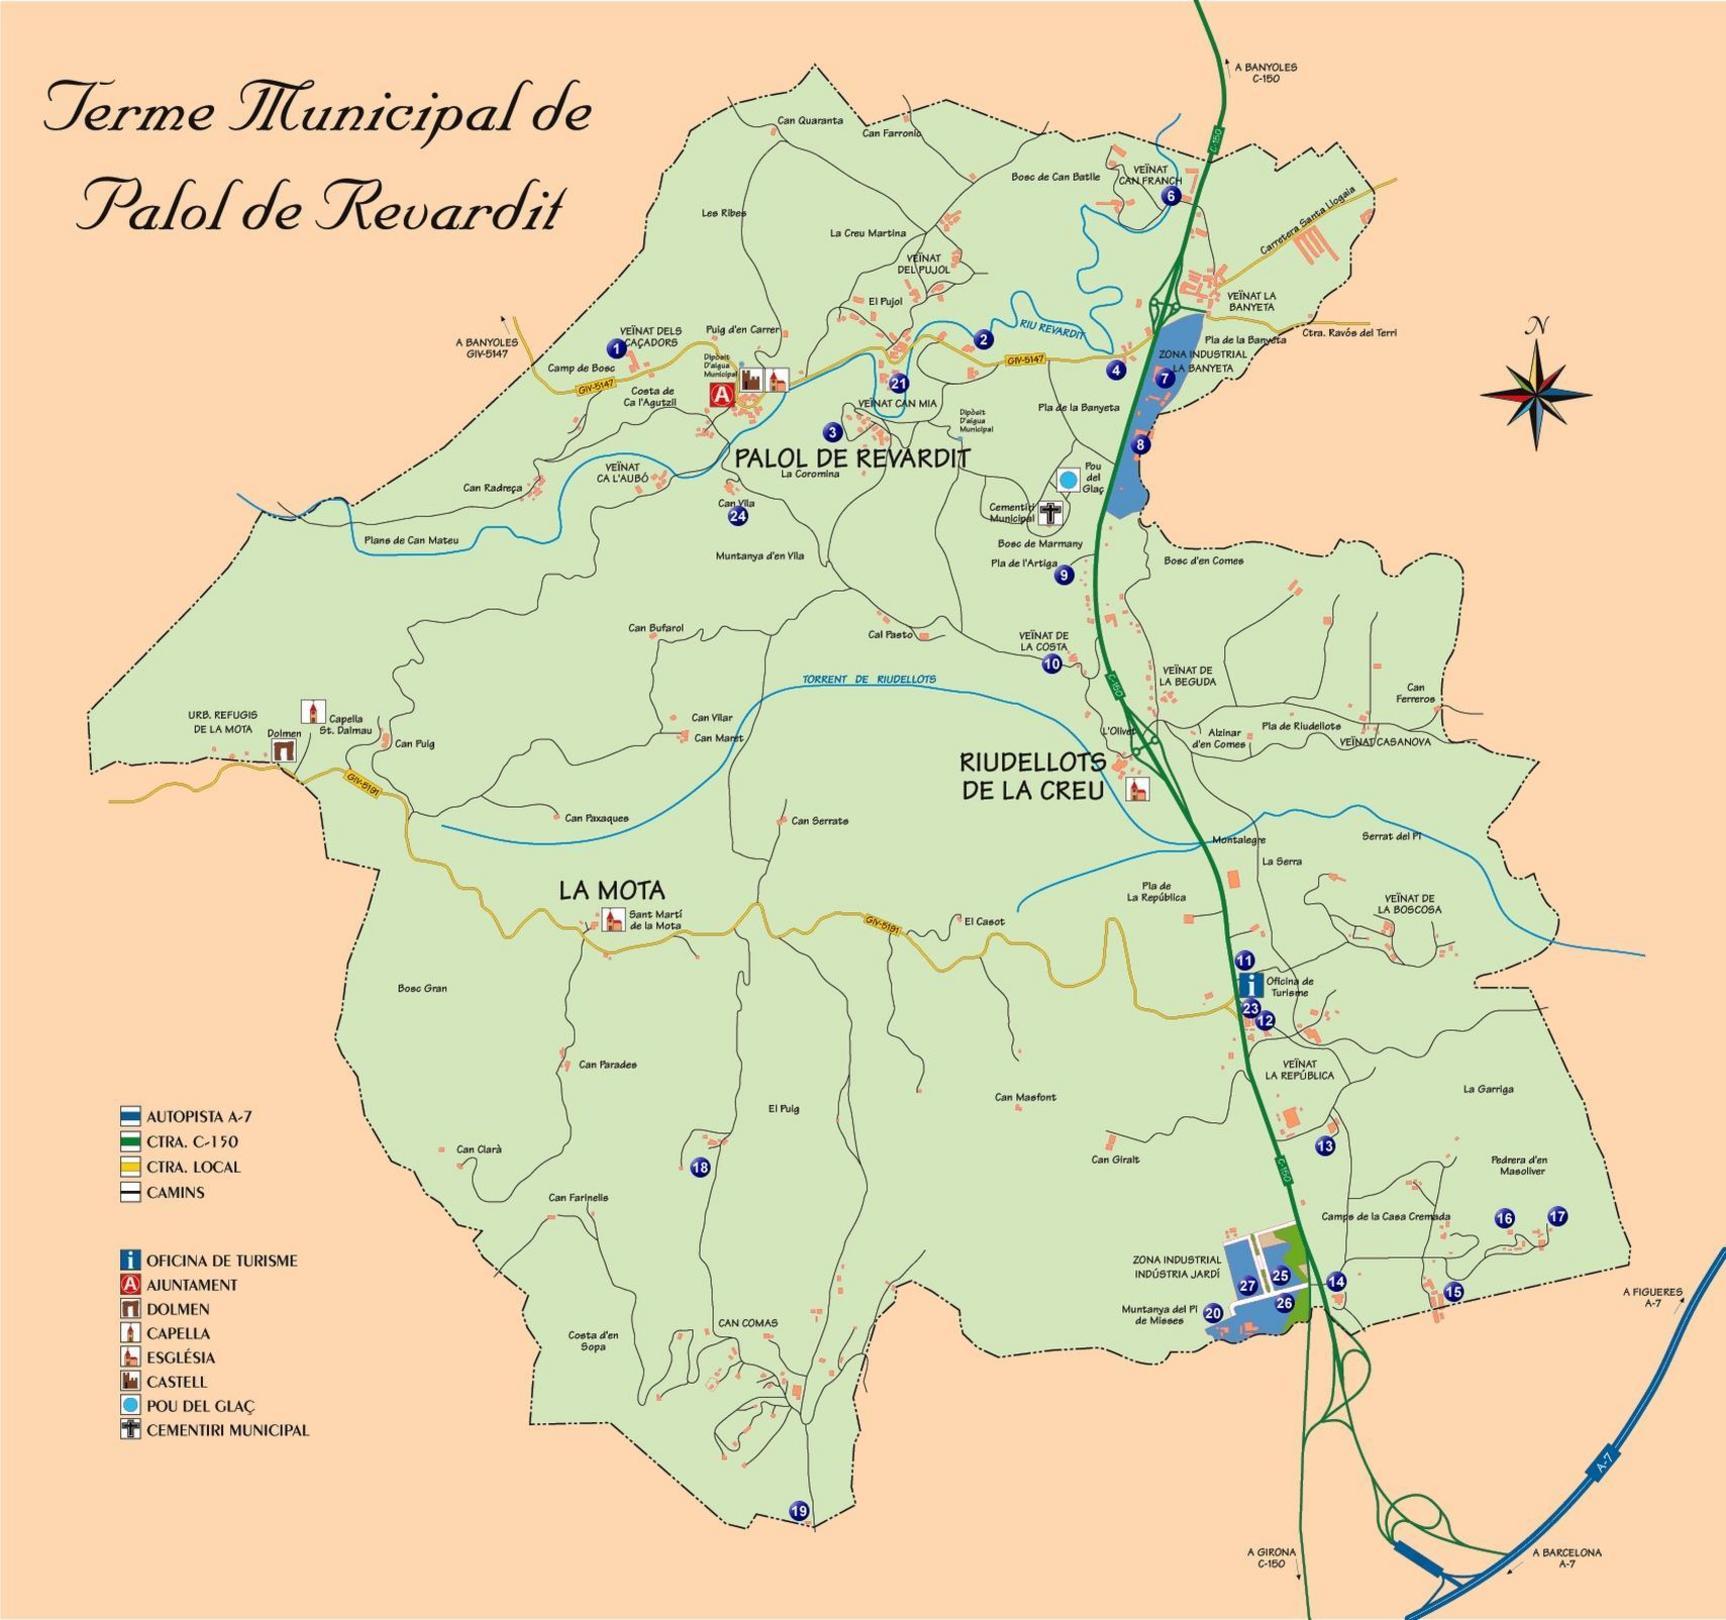 Mapa de Palol de Revardit, Gerona-Girona